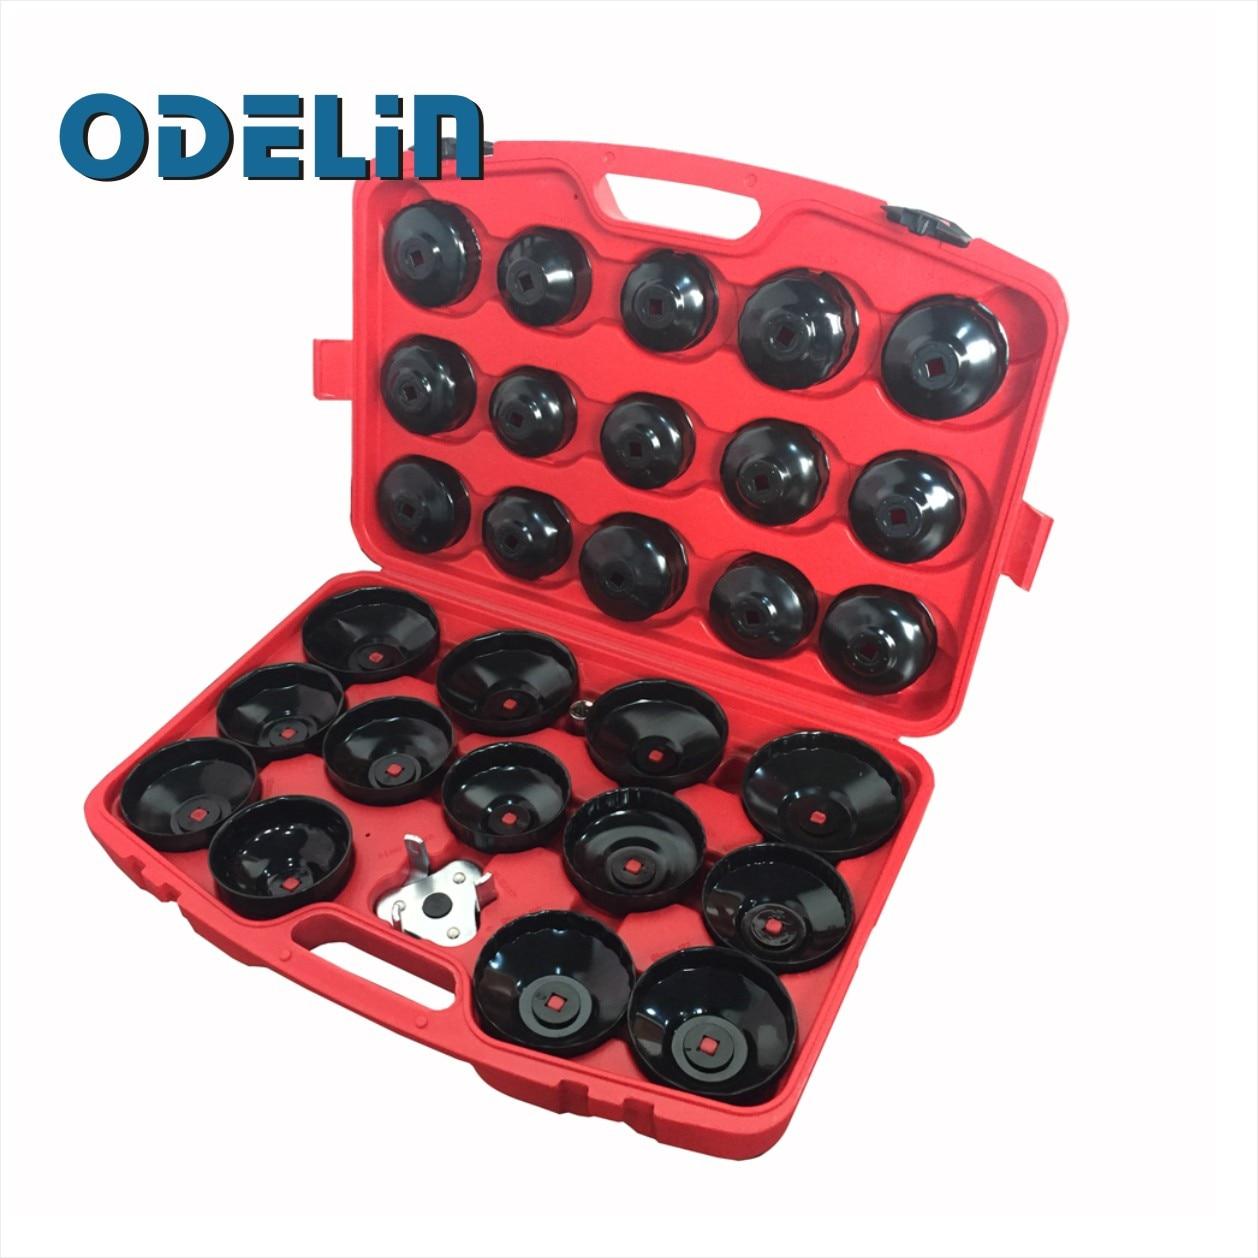 цена на 30pc Oil Filter Removal Wrench Cap Car Garage Tool Set Loosen Tighten Cup Socket